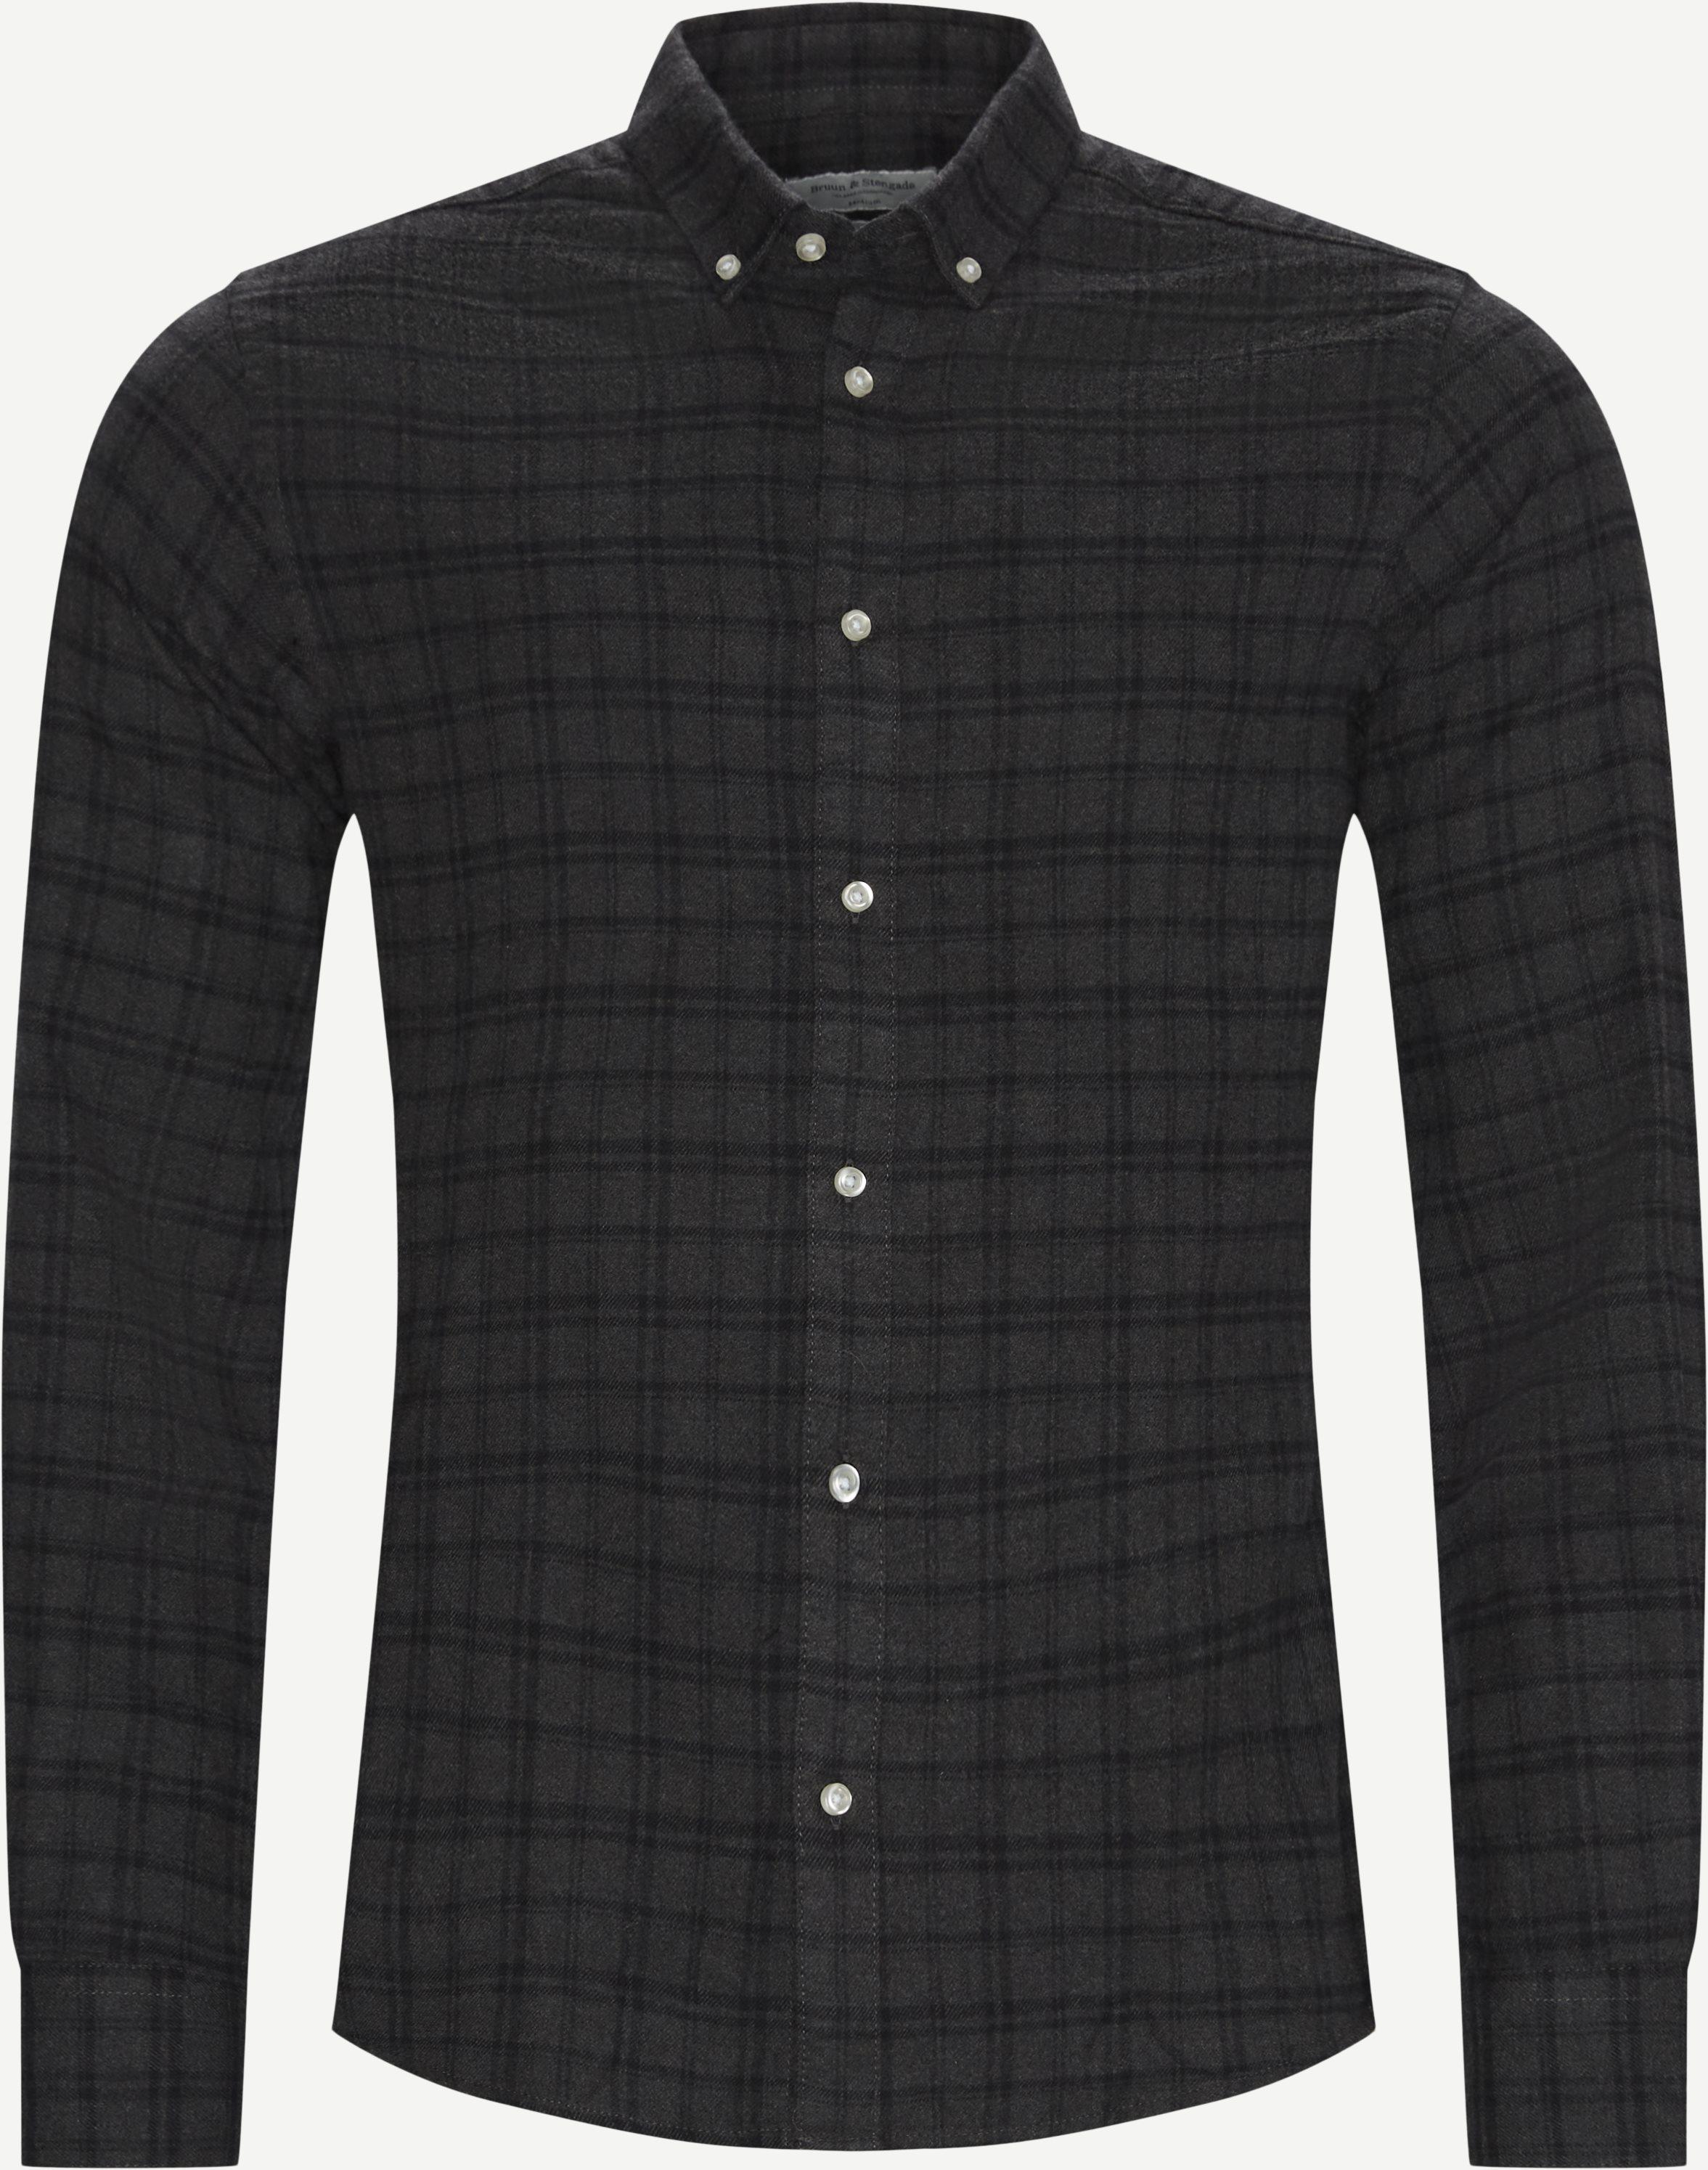 Hemden - Slim fit - Grau